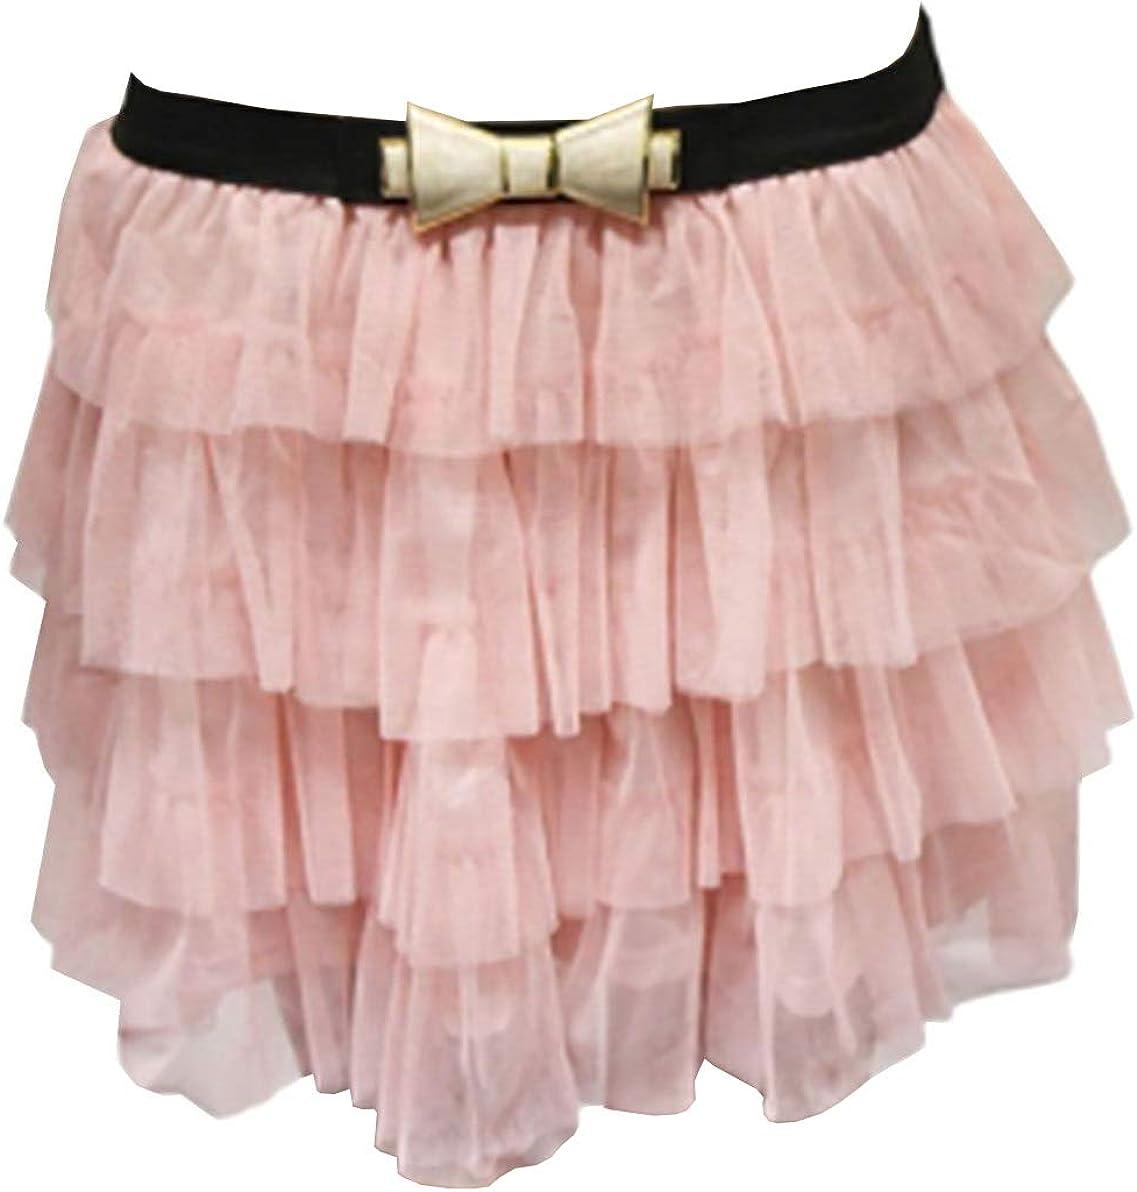 Rimi Hanger Womens Tiered 2 Layers Bow Belt Mesh Tutu Skirt Ladies Fancy Casual Wear Skirt US 2-10